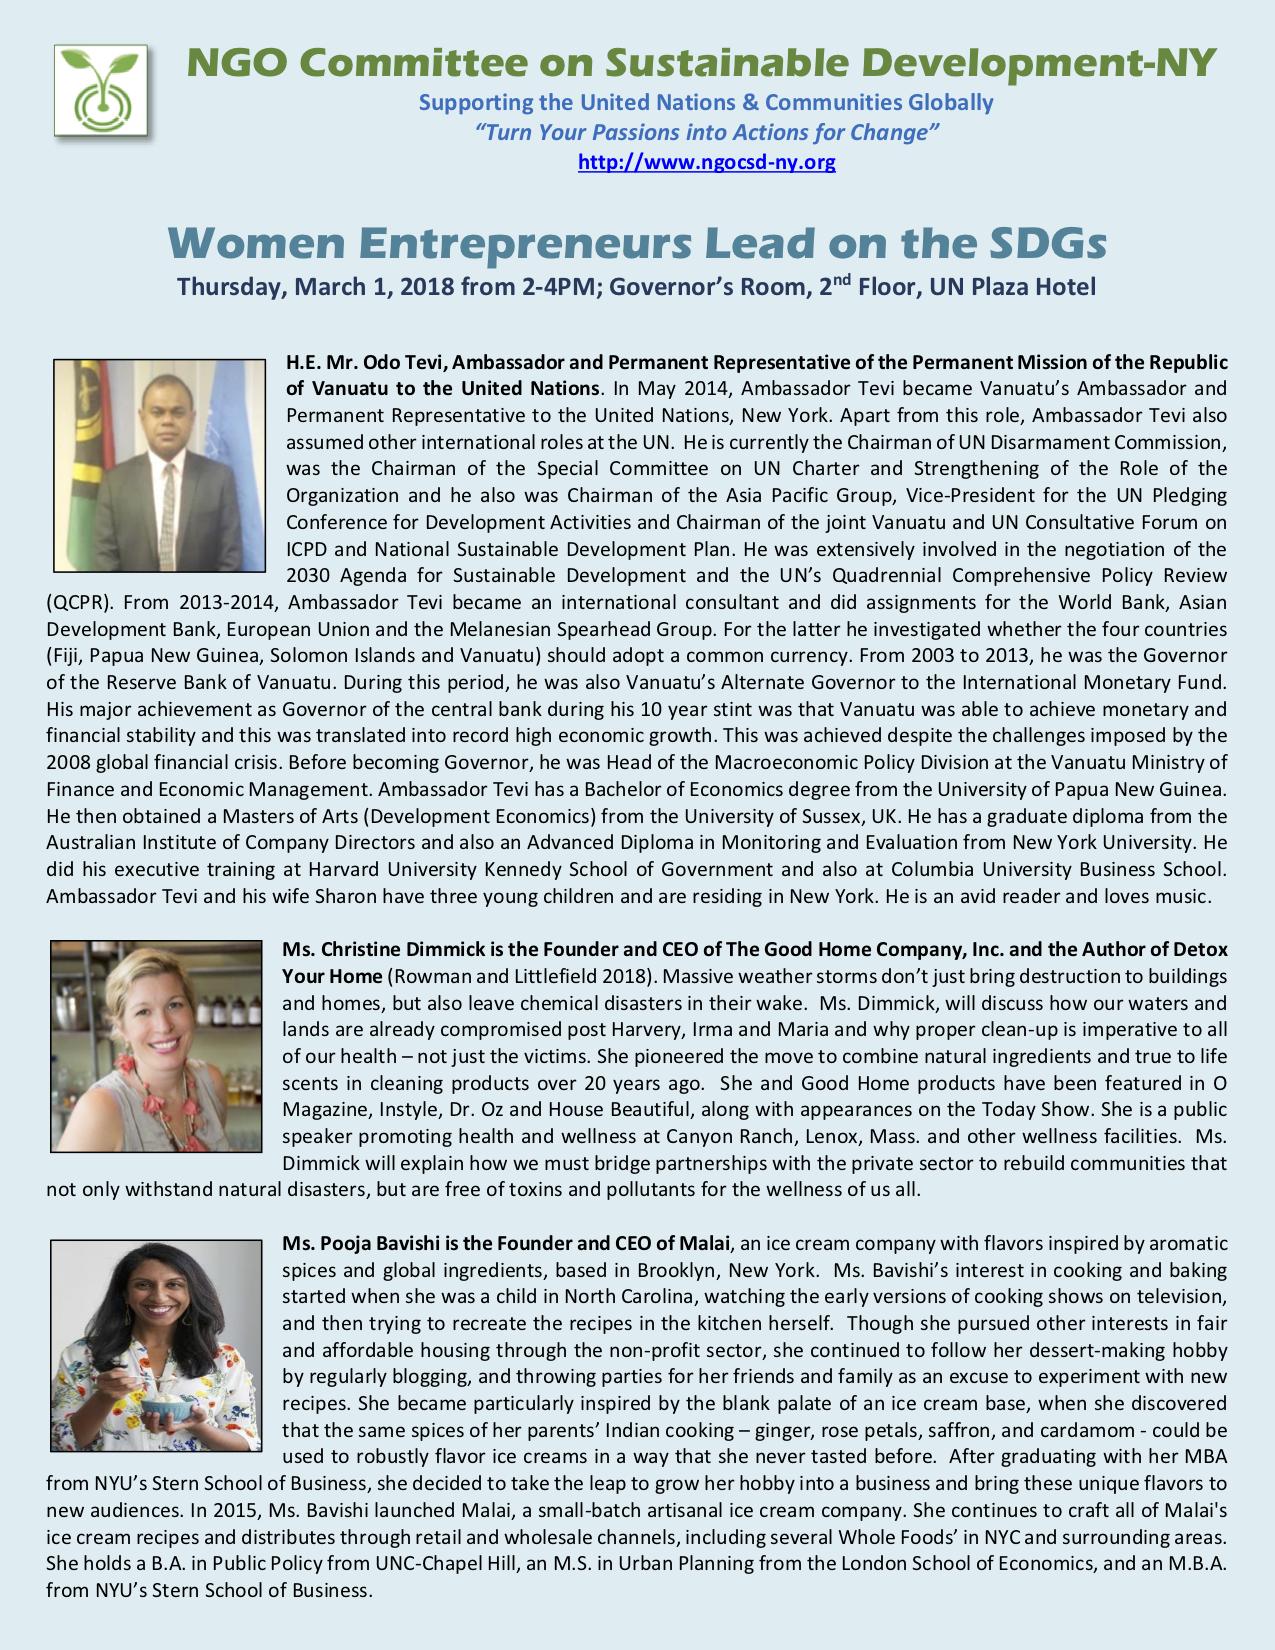 NGOCSD-NY 3-1-18 Women Entrepreneurs Photo Bios A3.png